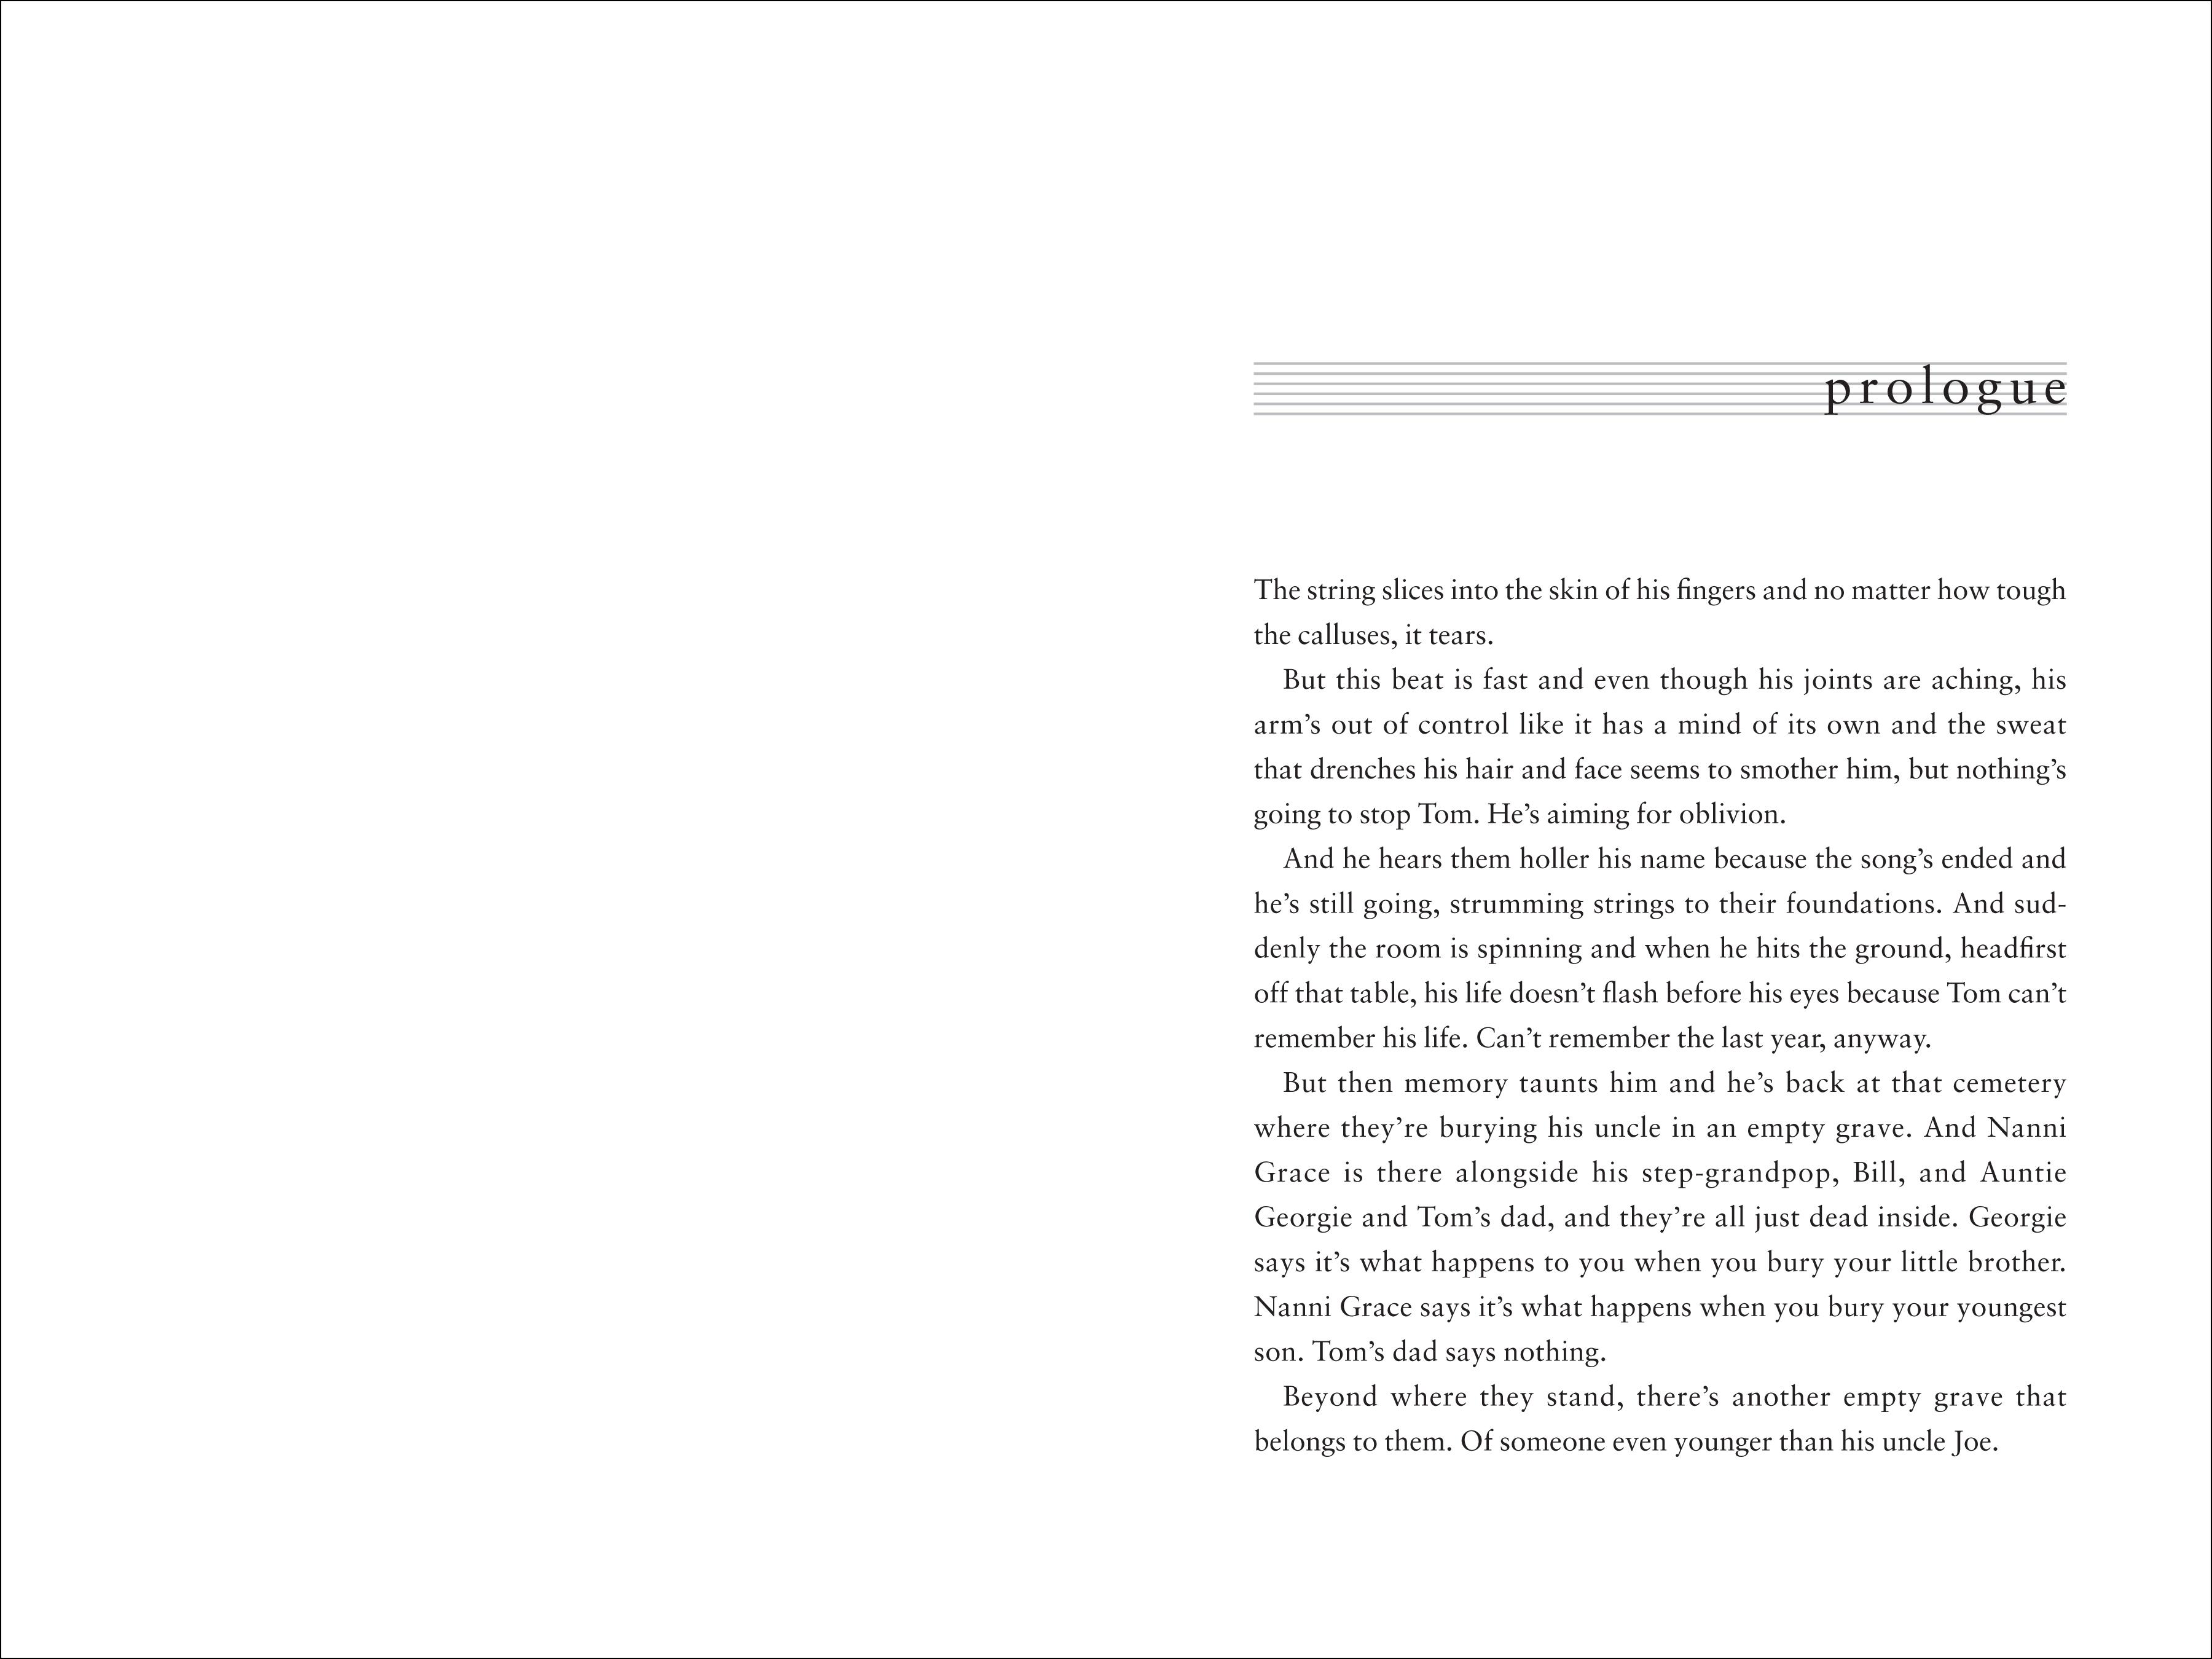 Prologue spread for THE PIPER'S SON